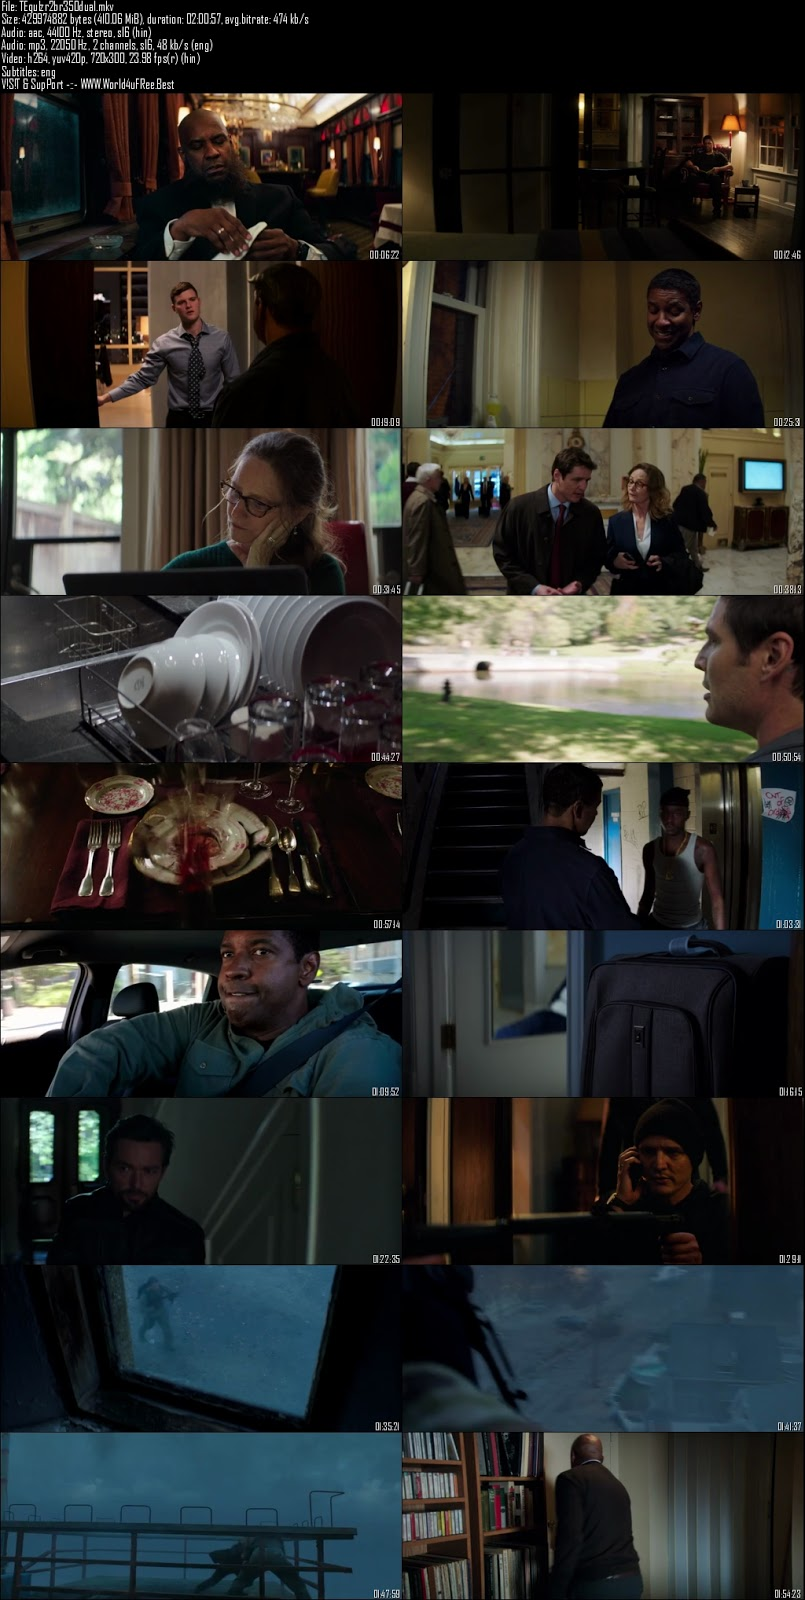 The Equalizer 2014 720p X264 Dual Audio Hindi English Movies